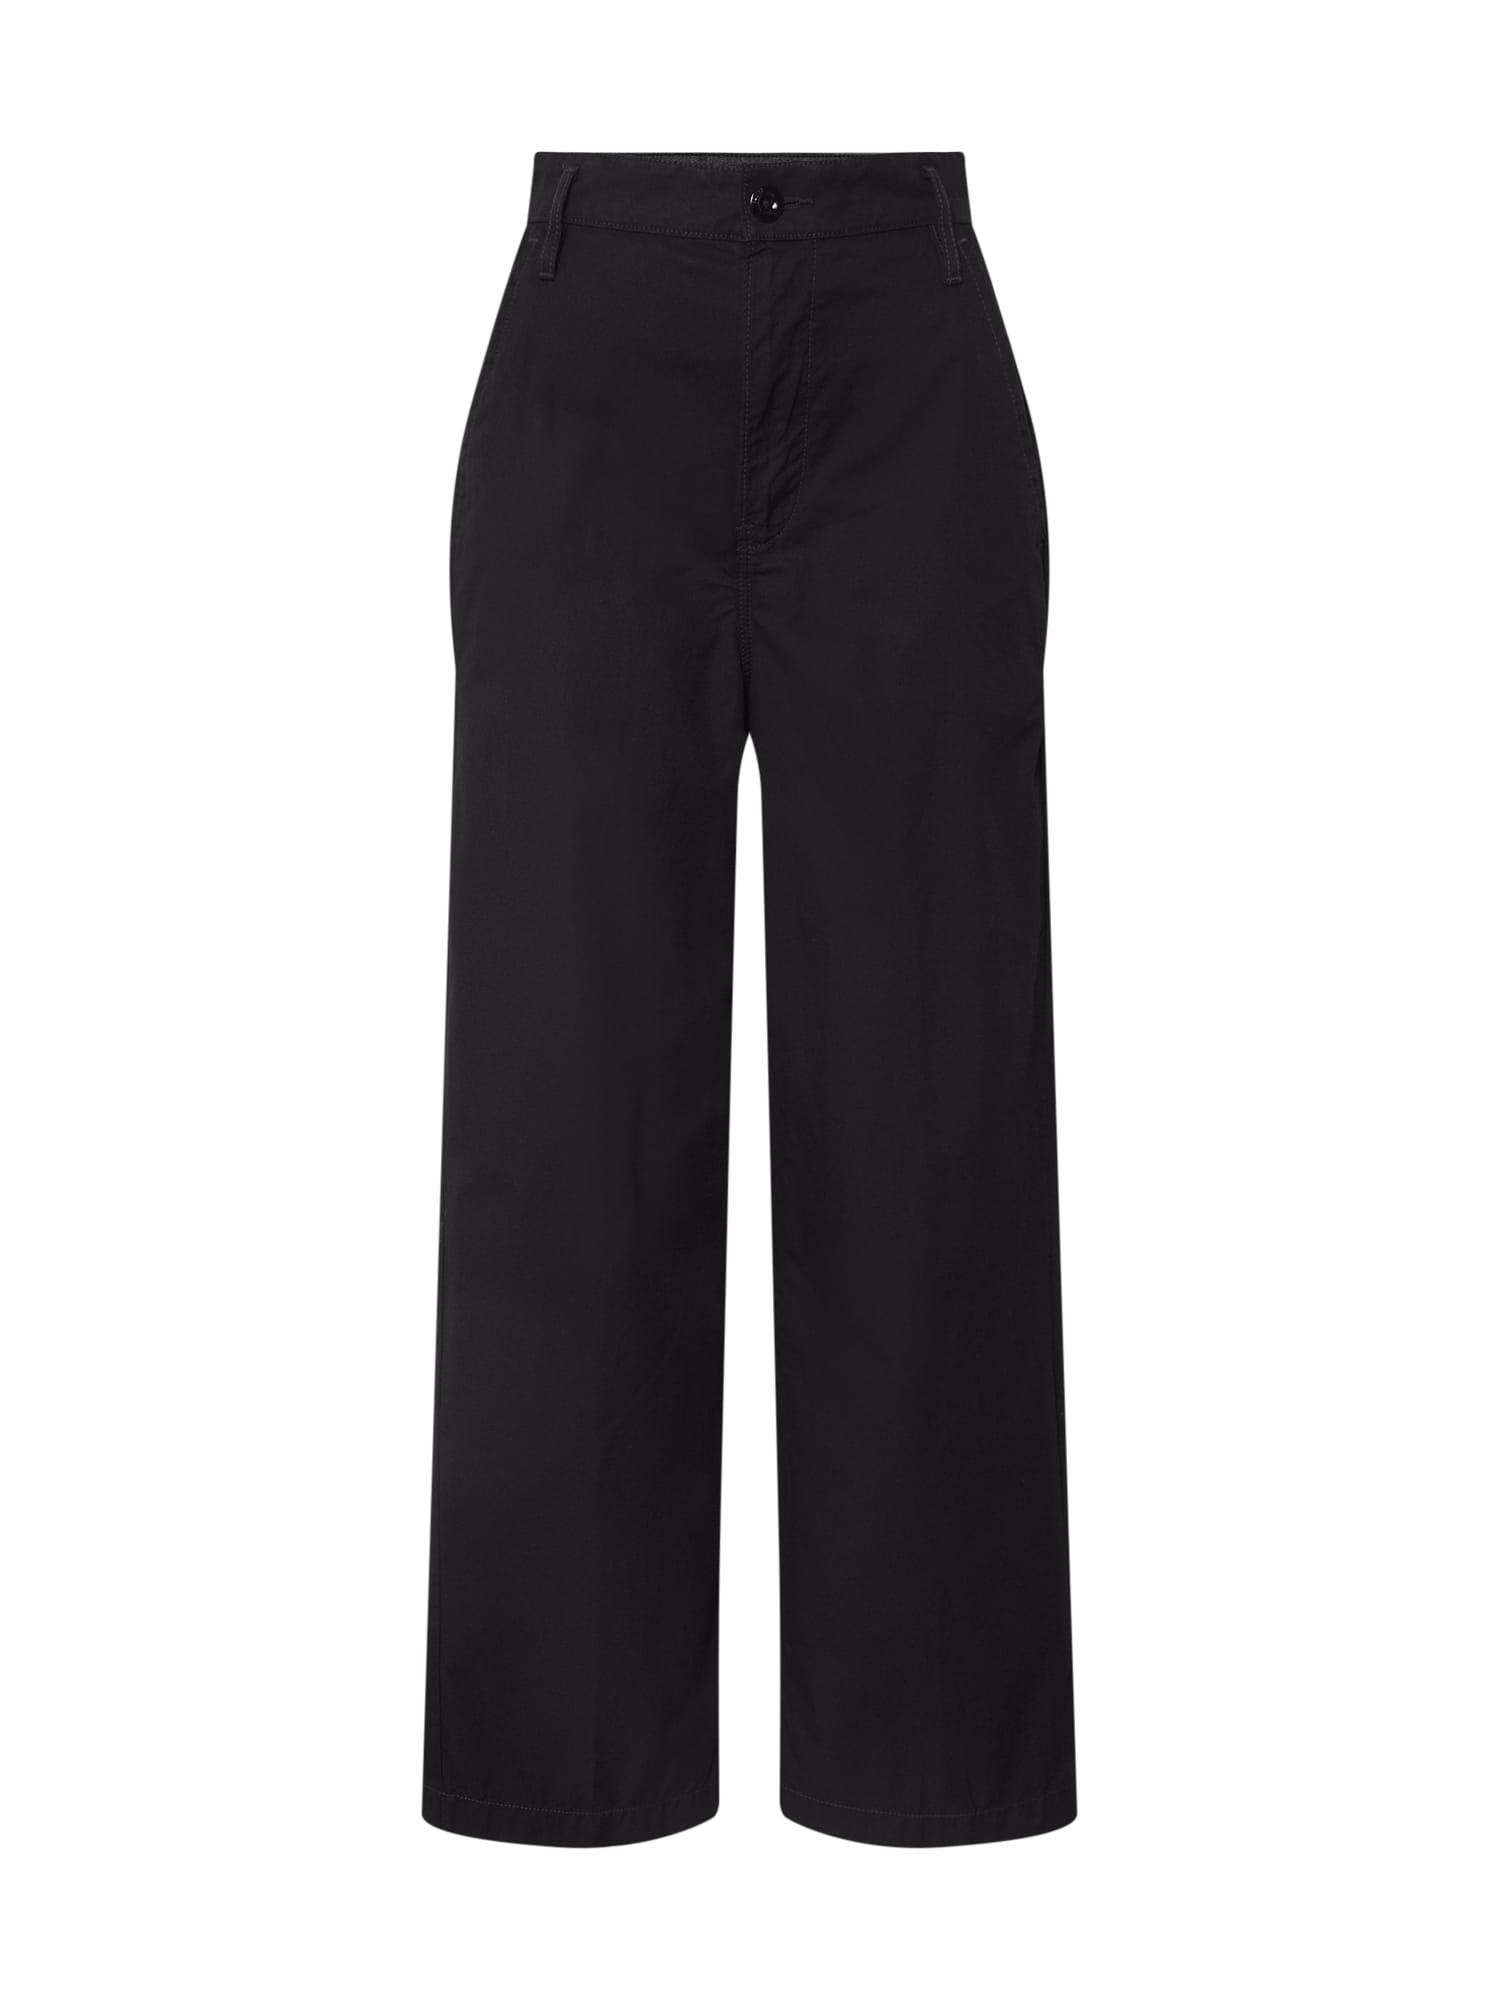 G-Star RAW Chino stiliaus kelnės 'Vitrif' juoda